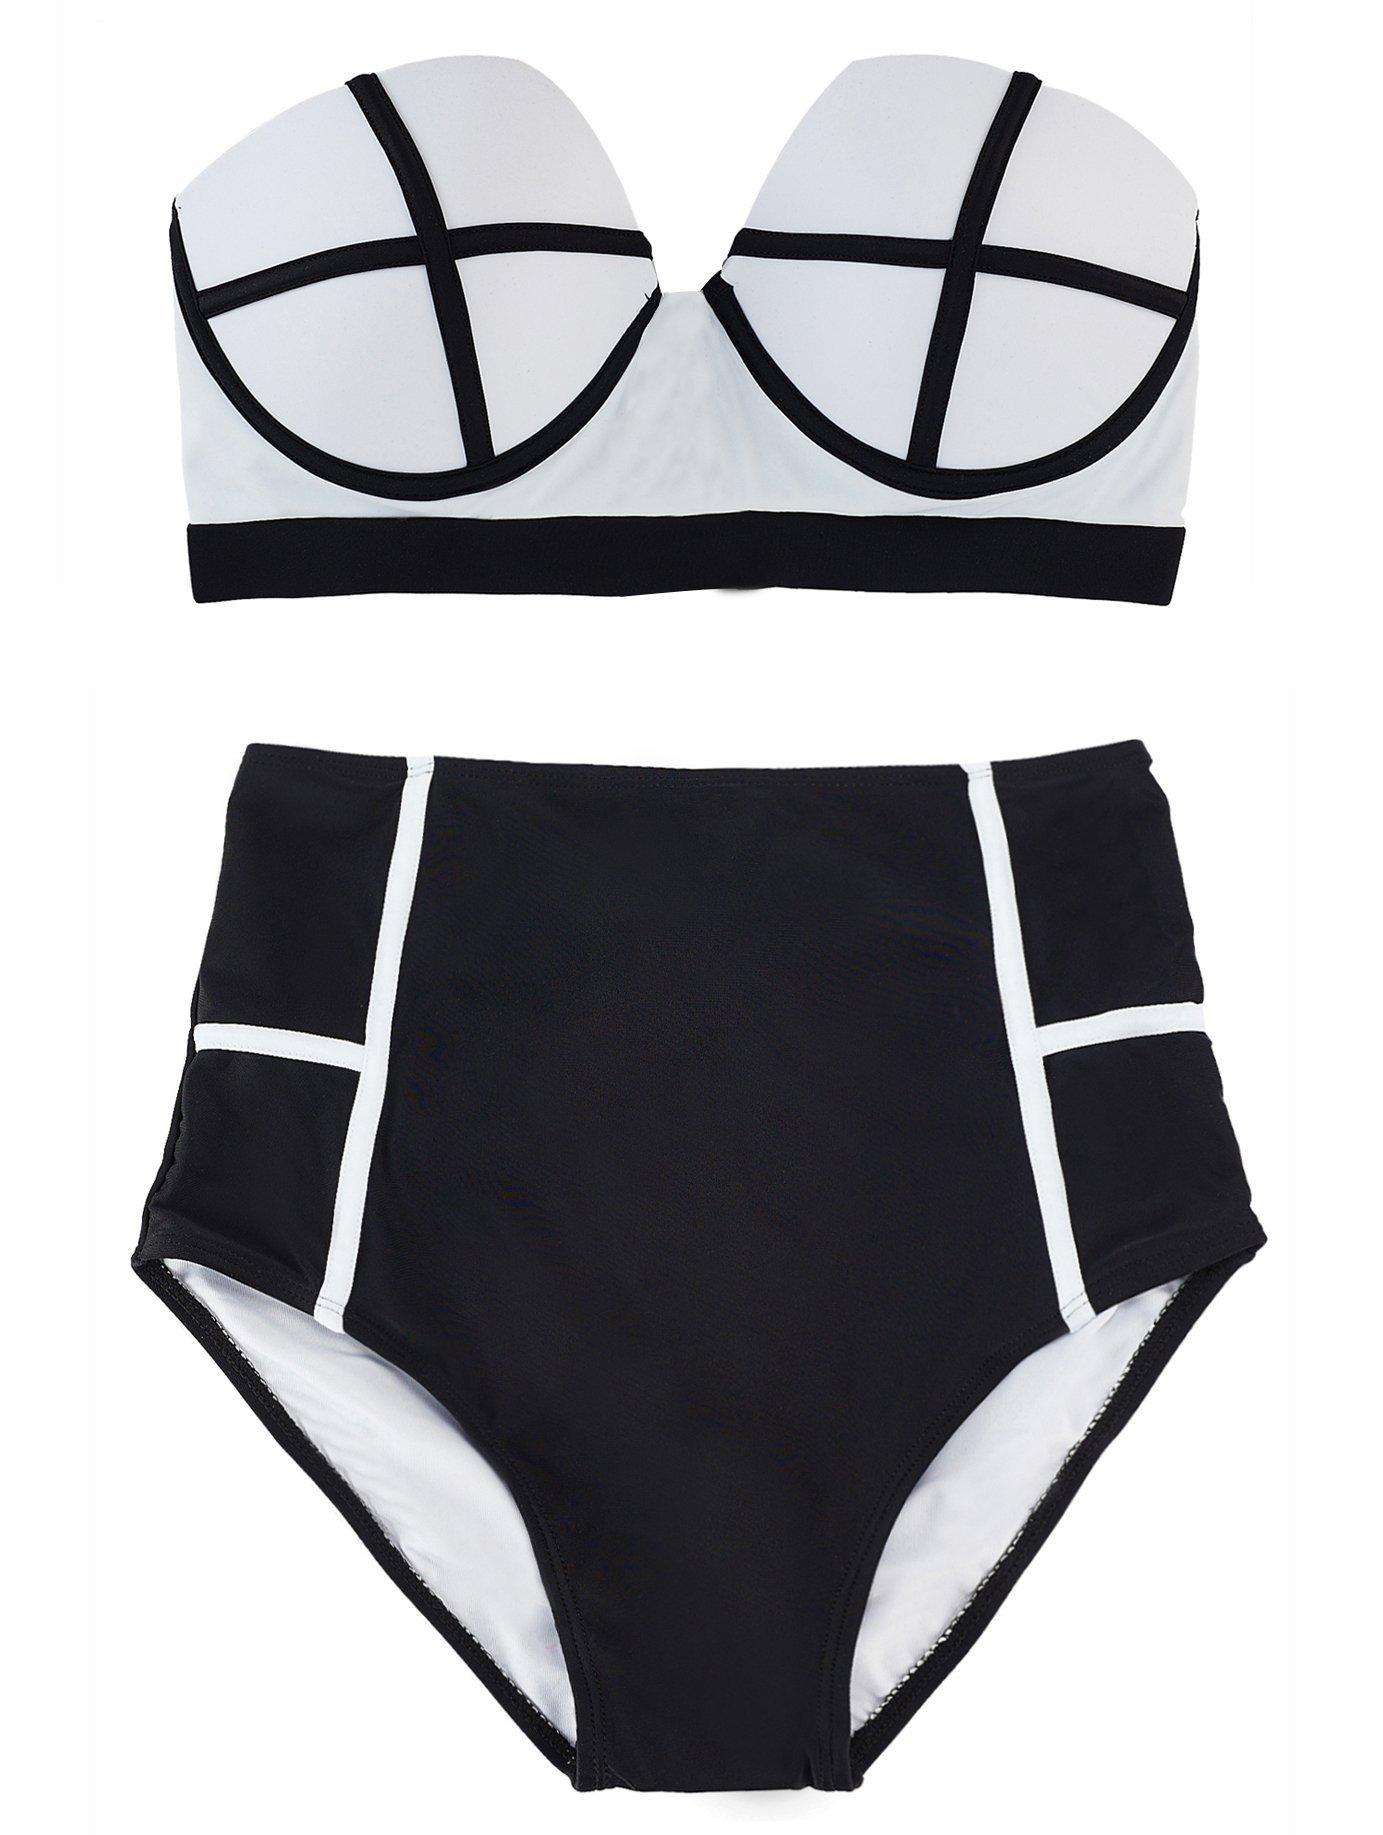 LA PLAGE Women's Colorful High Waist Padded Bathing Suit Size US XX-Large White by LA PLAGE (Image #4)